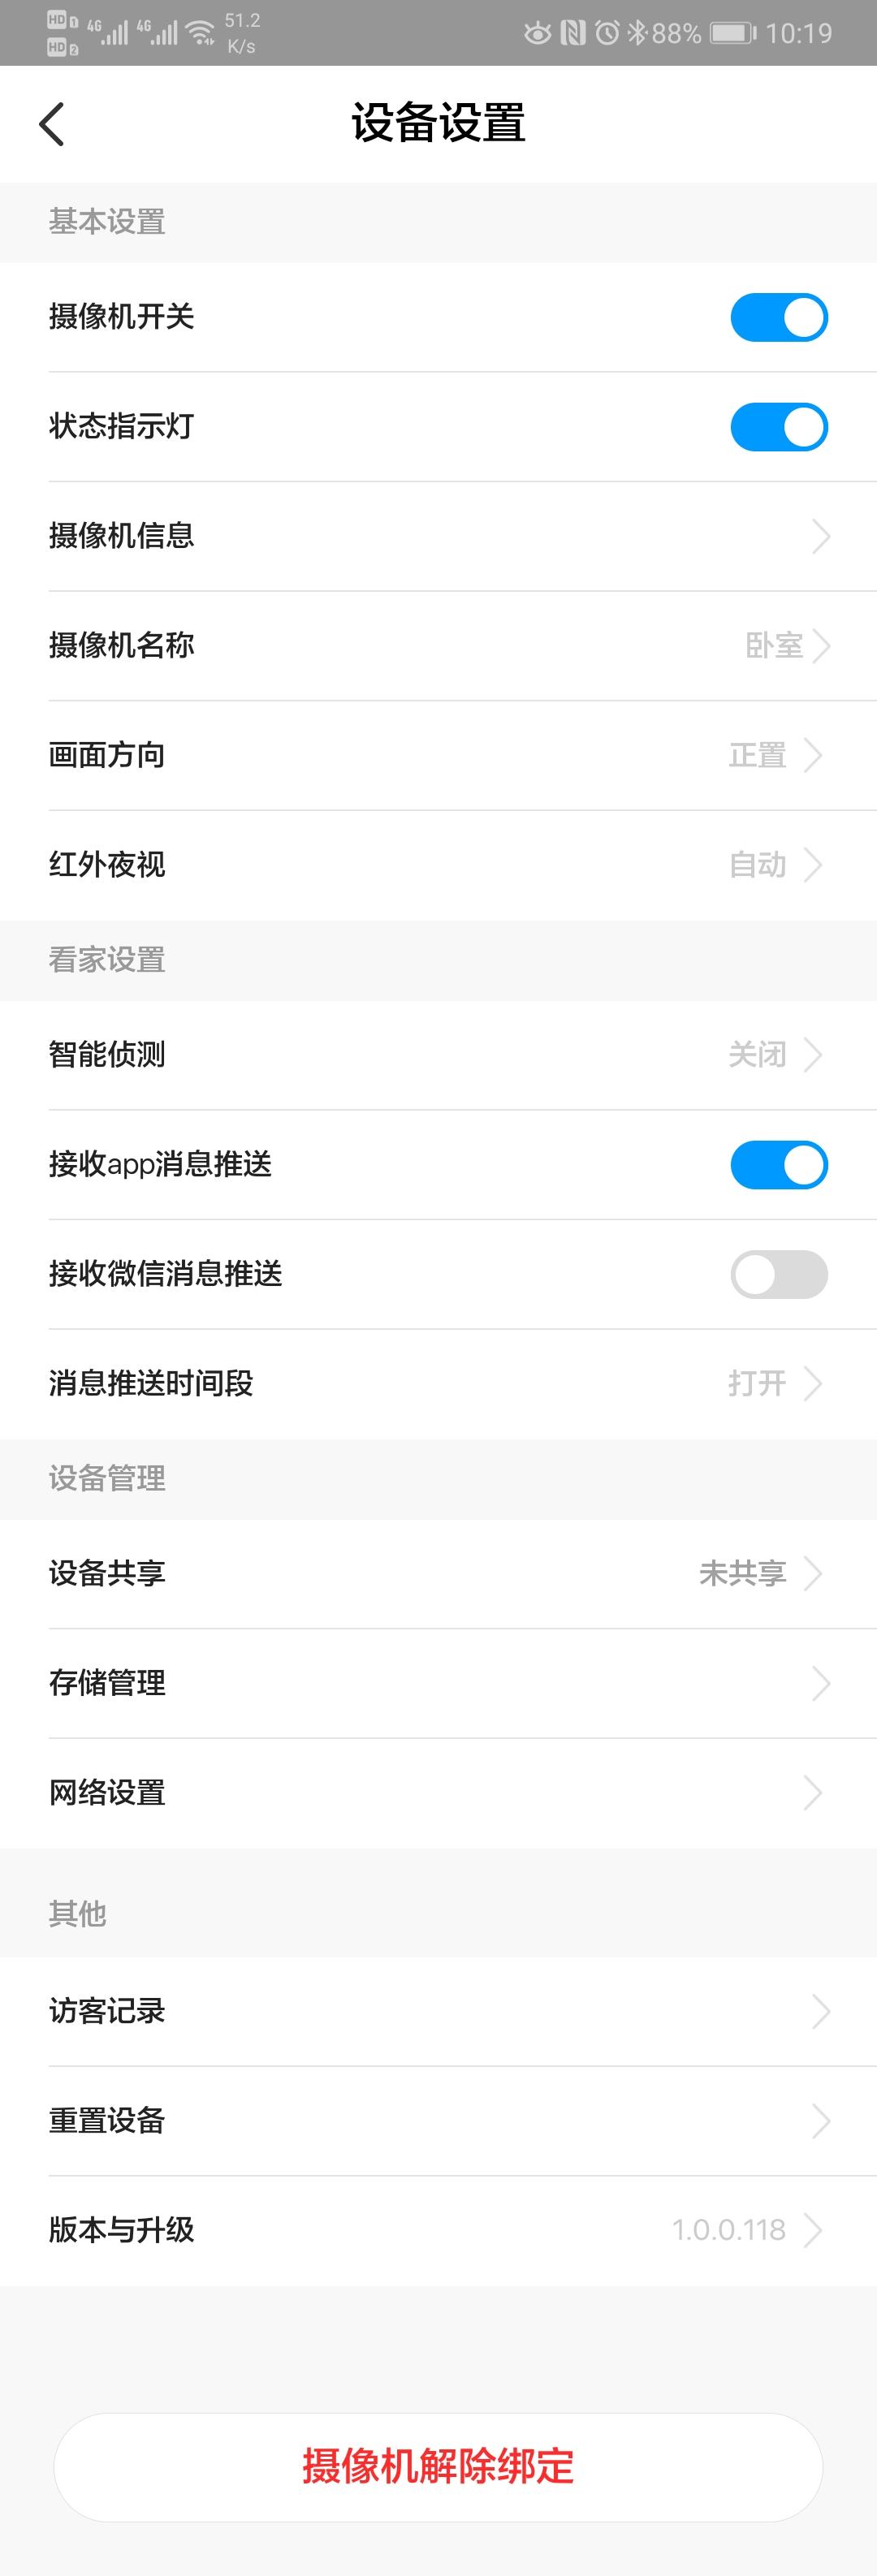 Screenshot_20190223_221917_com.huawei.ipc_honor.jpg